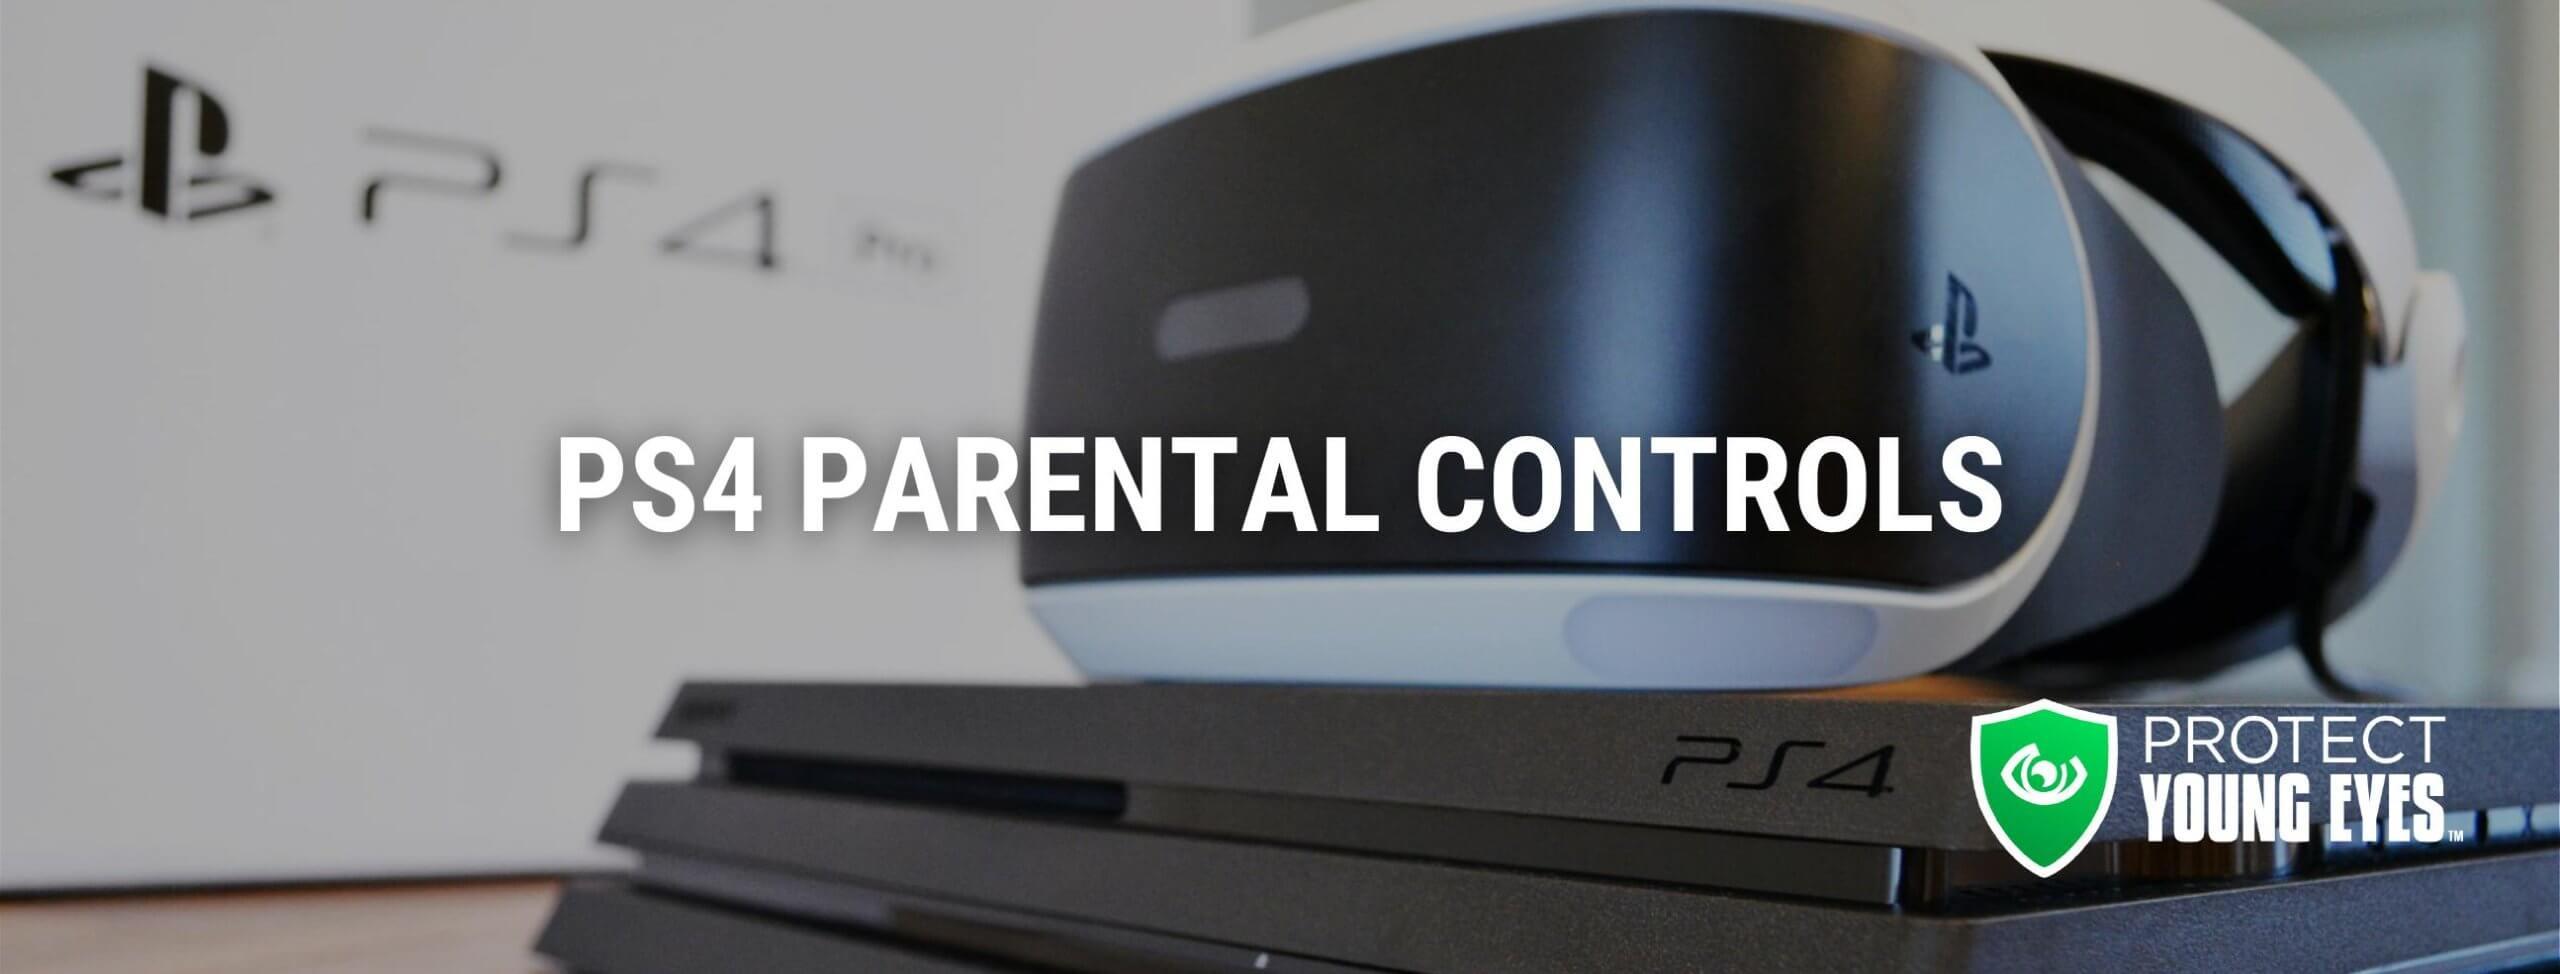 PlayStation 4 Parental Controls PYE